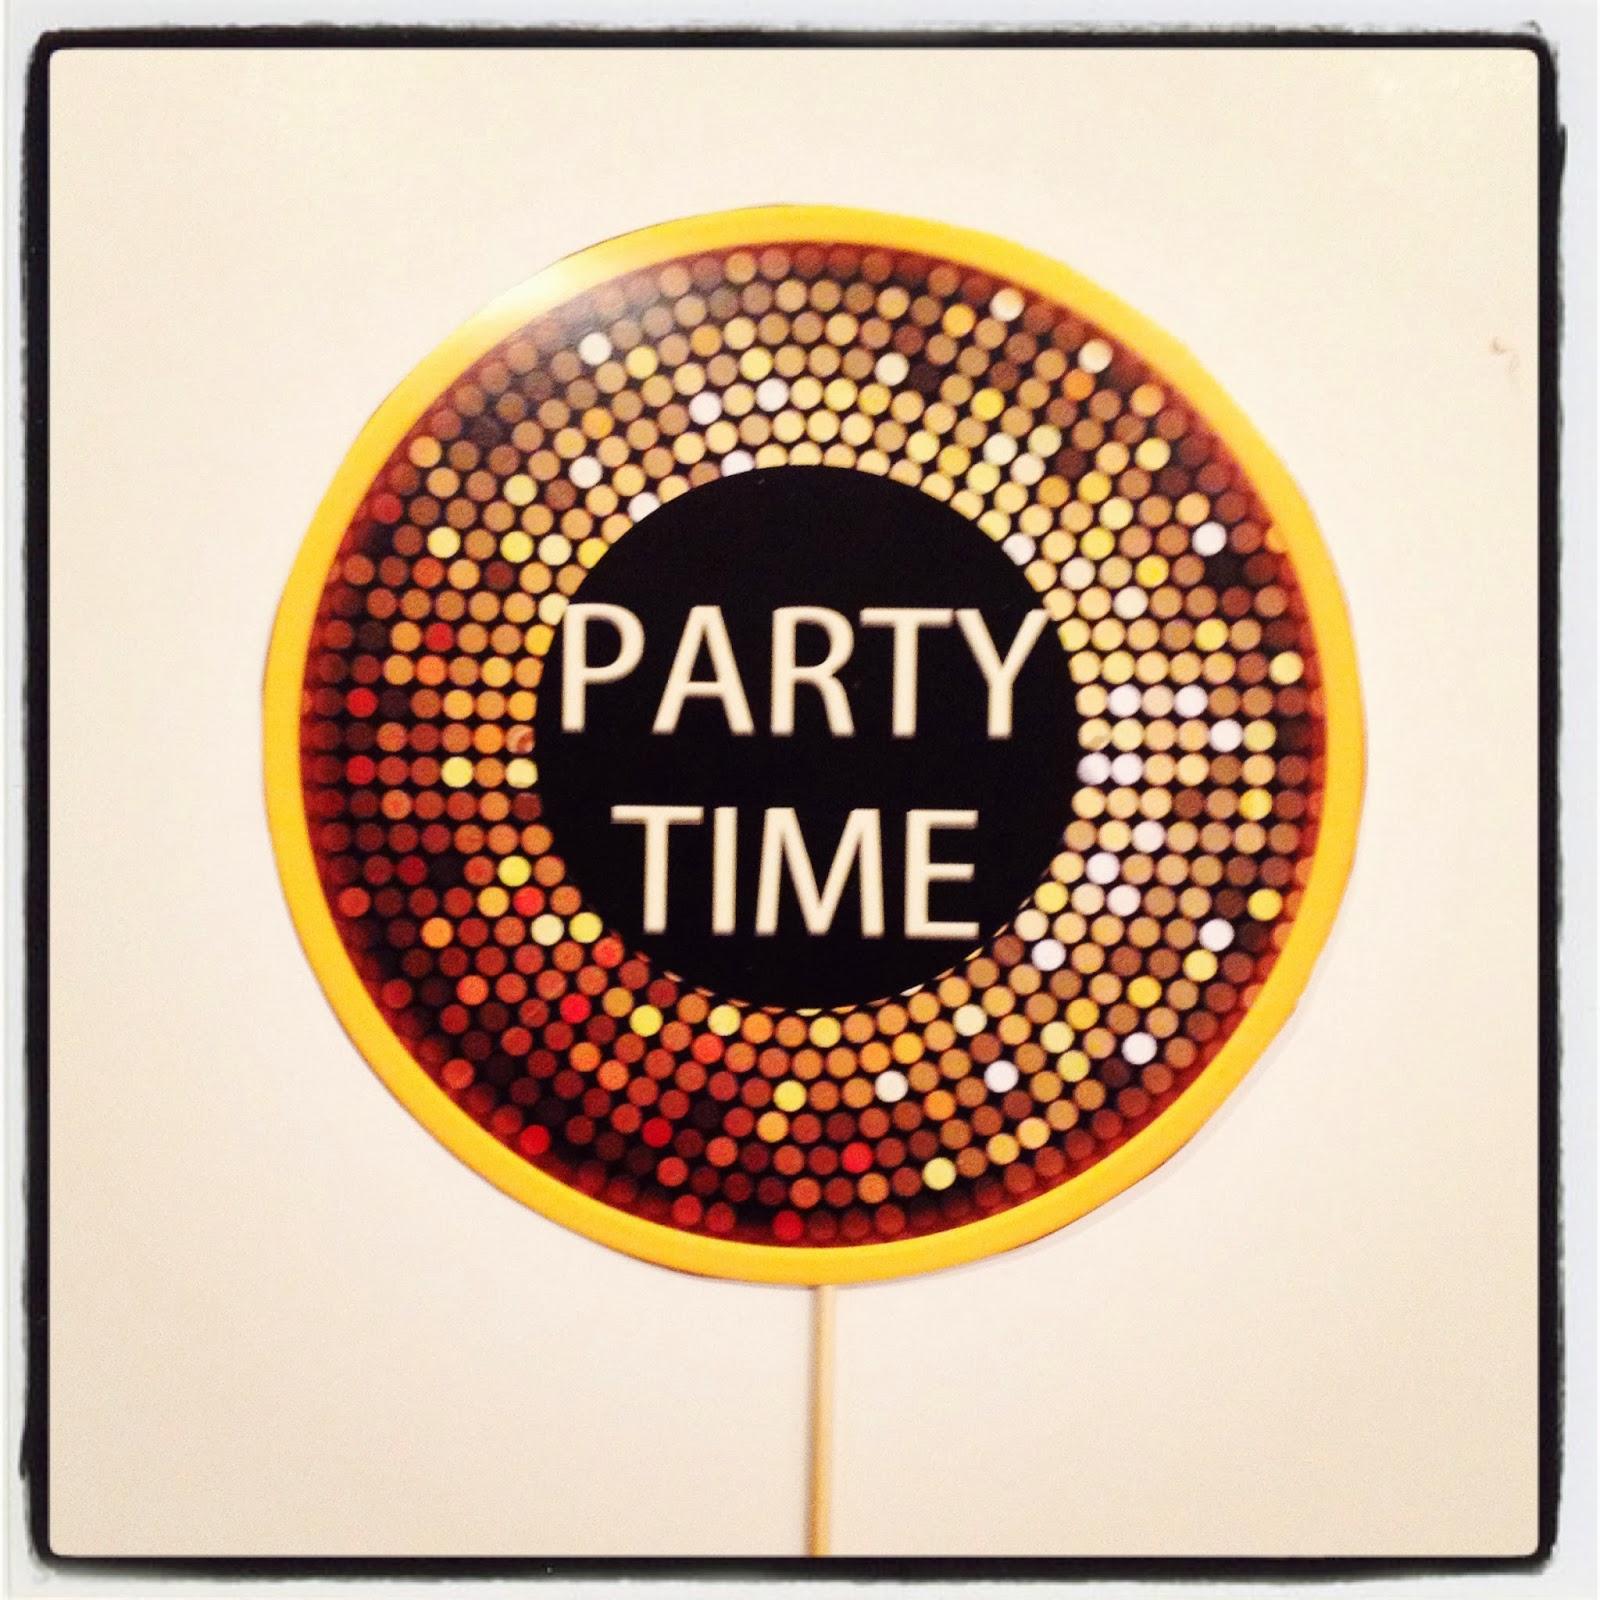 Disko topu zeminli parti zamanı kartı